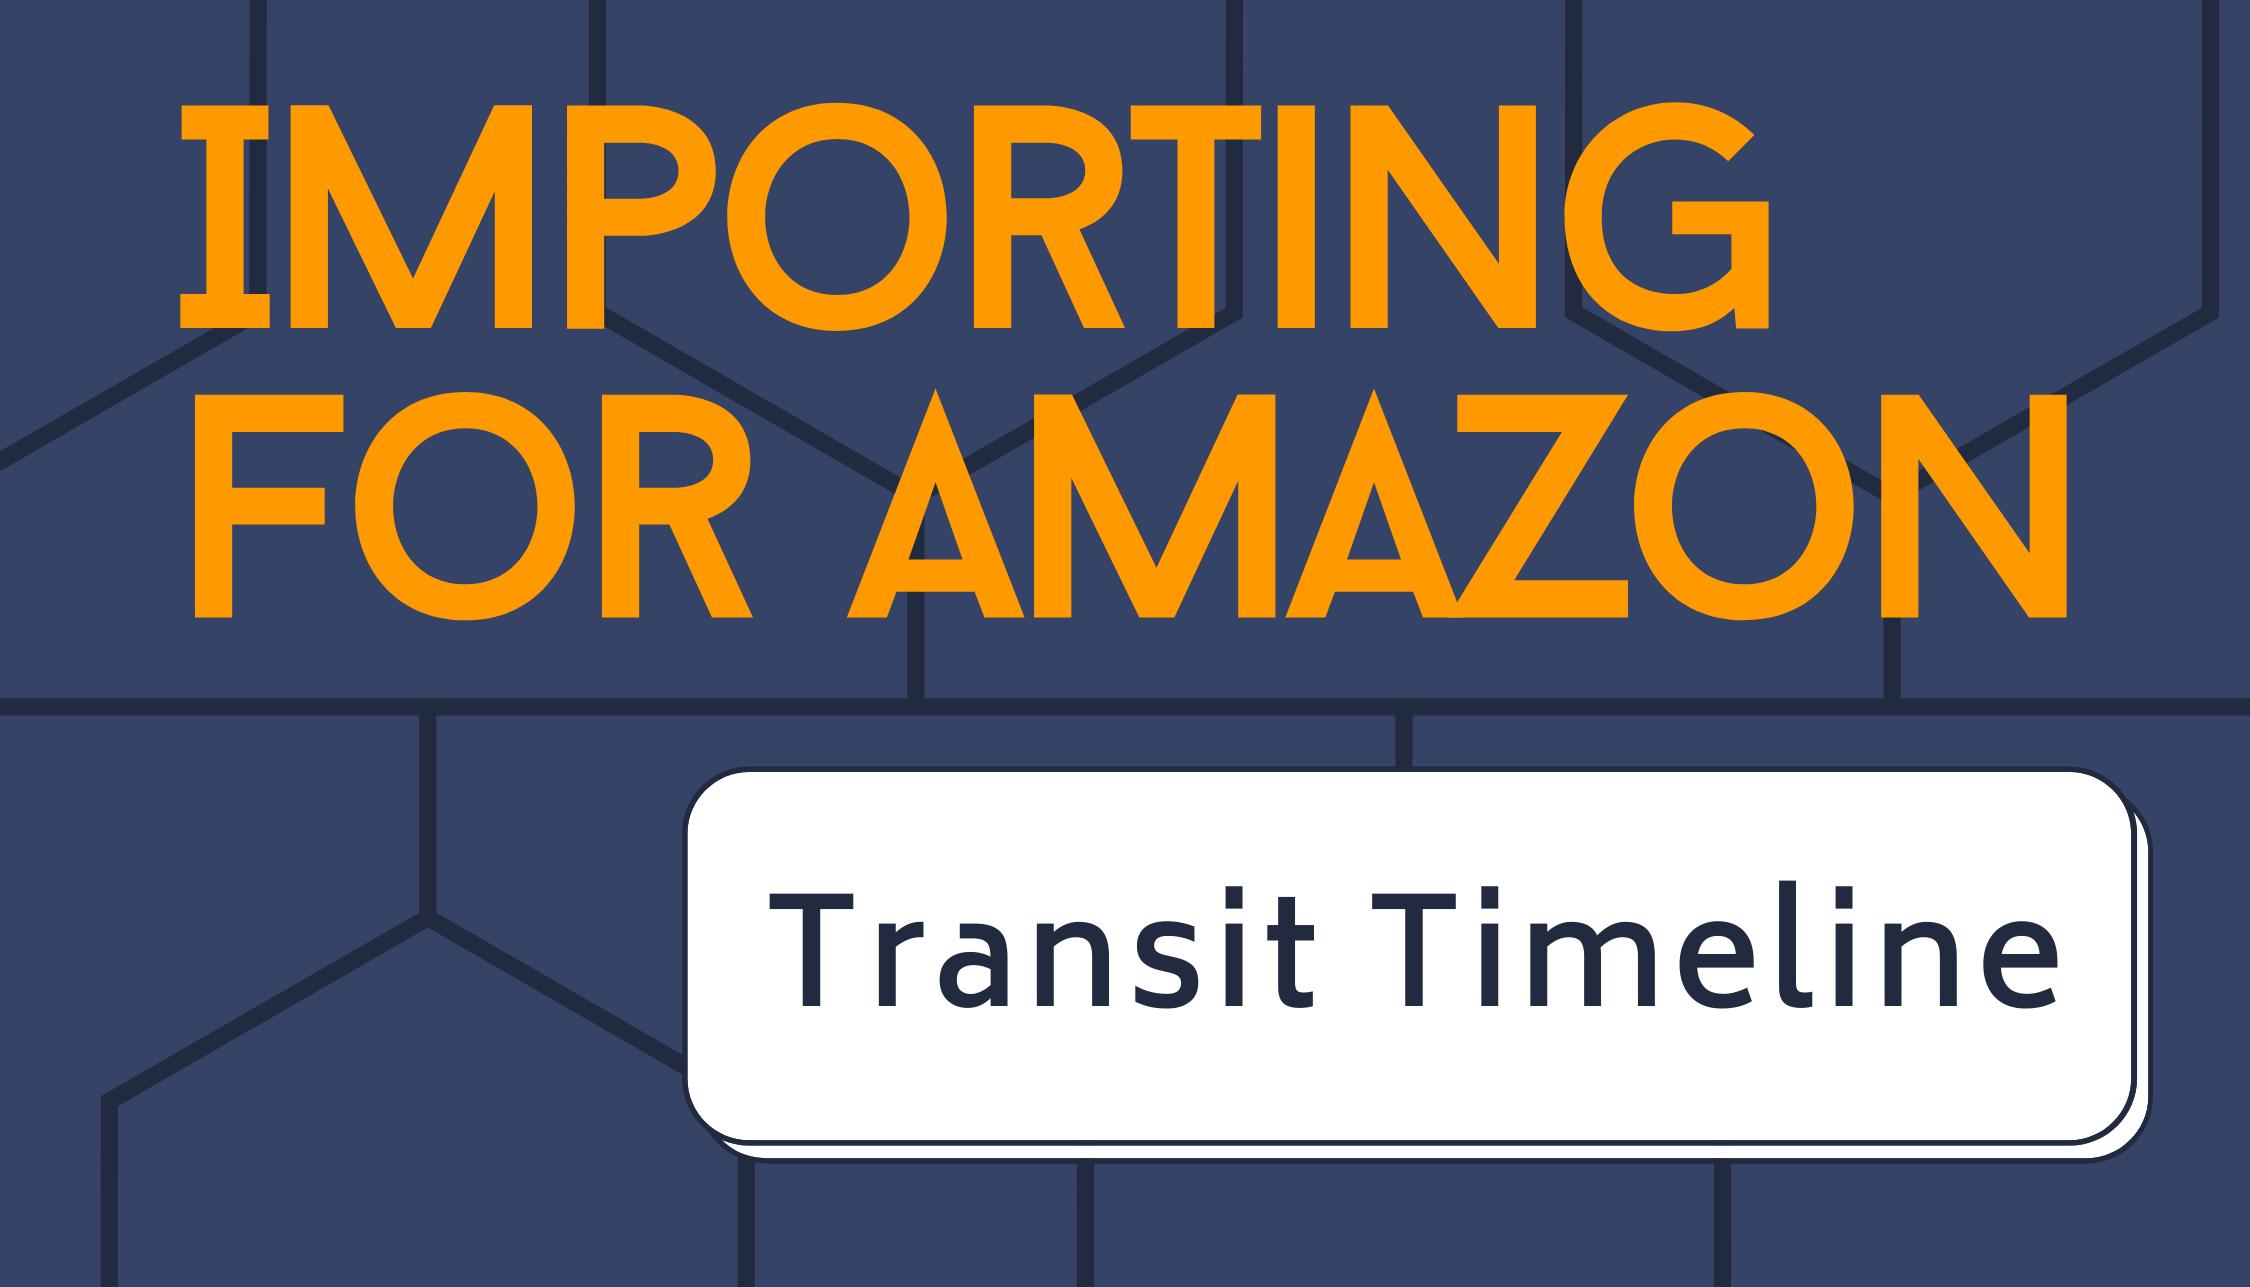 Importing for Amazon | Transit Timeline